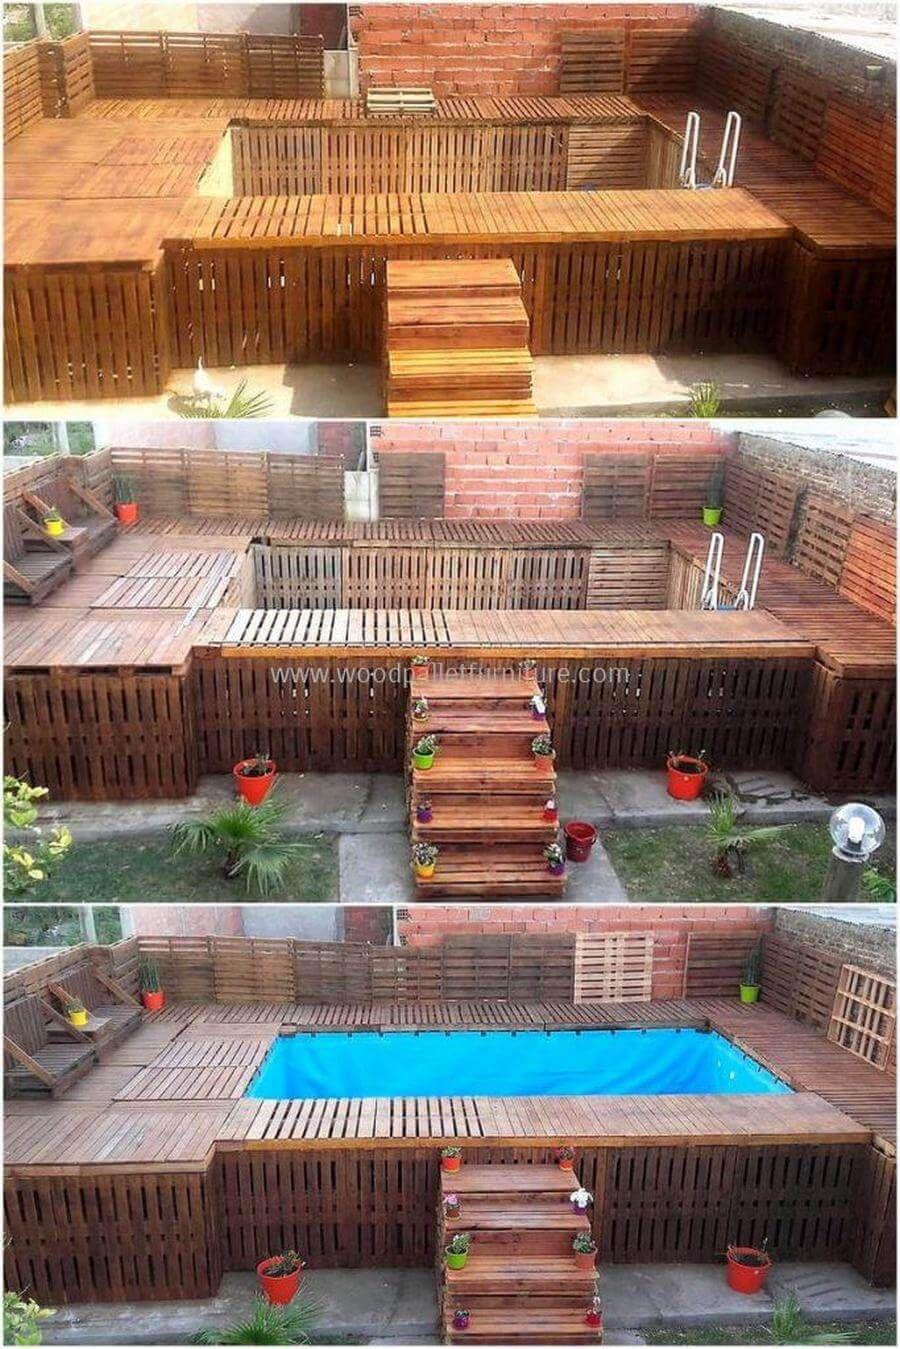 60 Diy Ideas For Wood Pallet Garden Terrace Pallet Patio Pallet